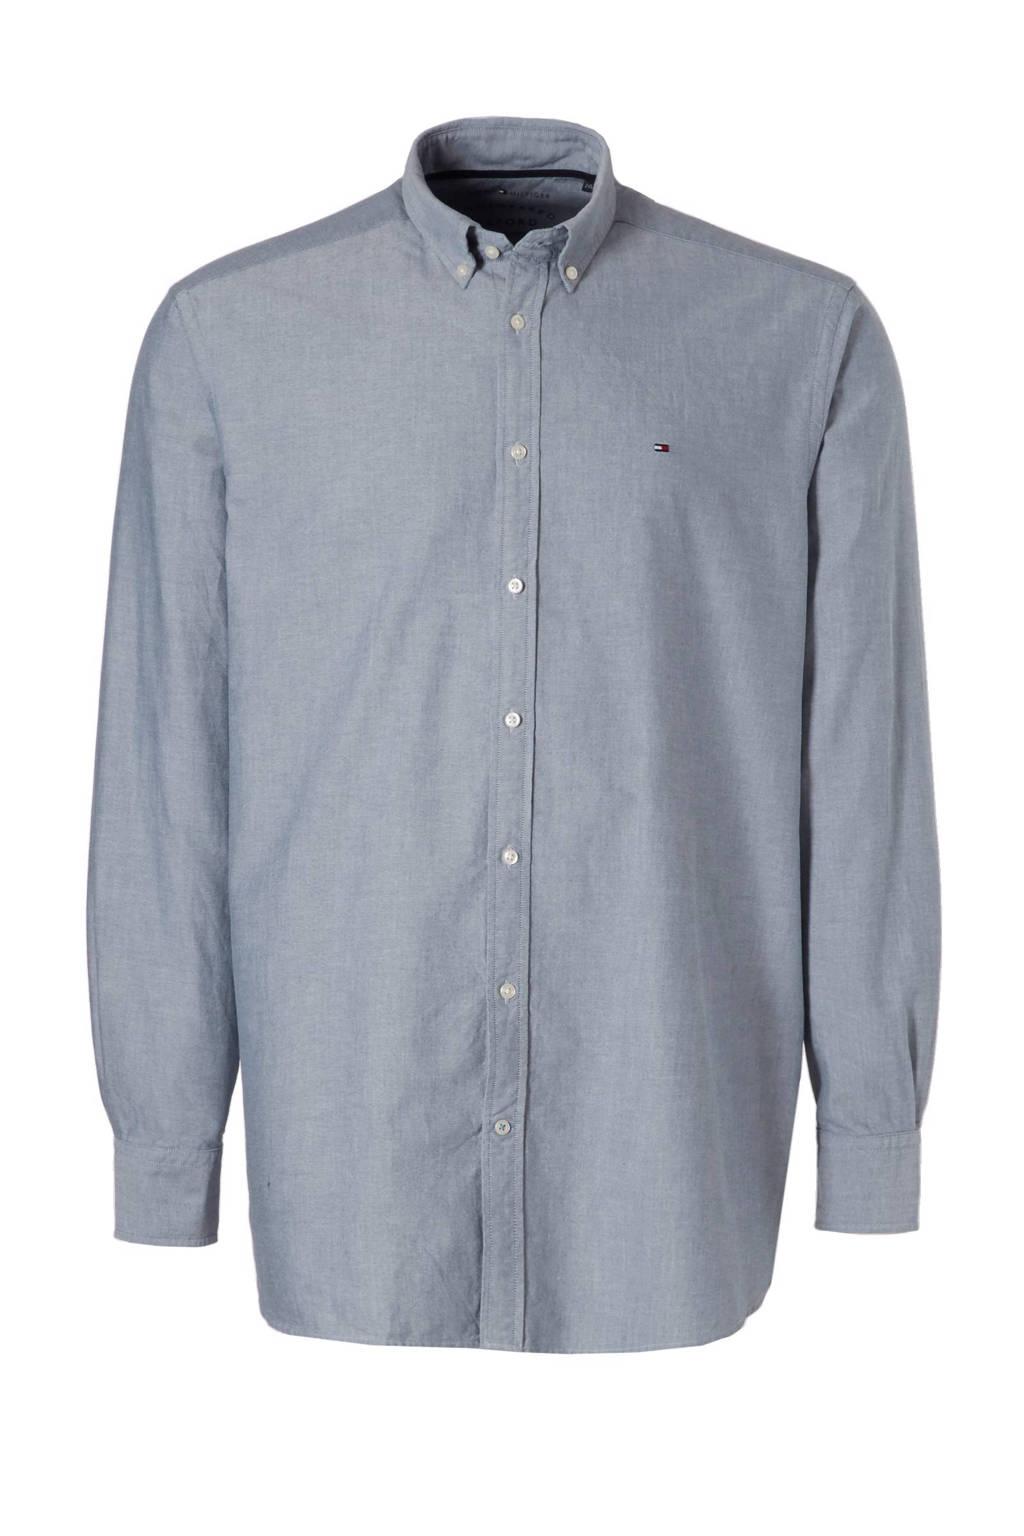 2288f5102 Tommy Hilfiger Big & Tall +size Engineered Oxford regular fit overhemd, ...